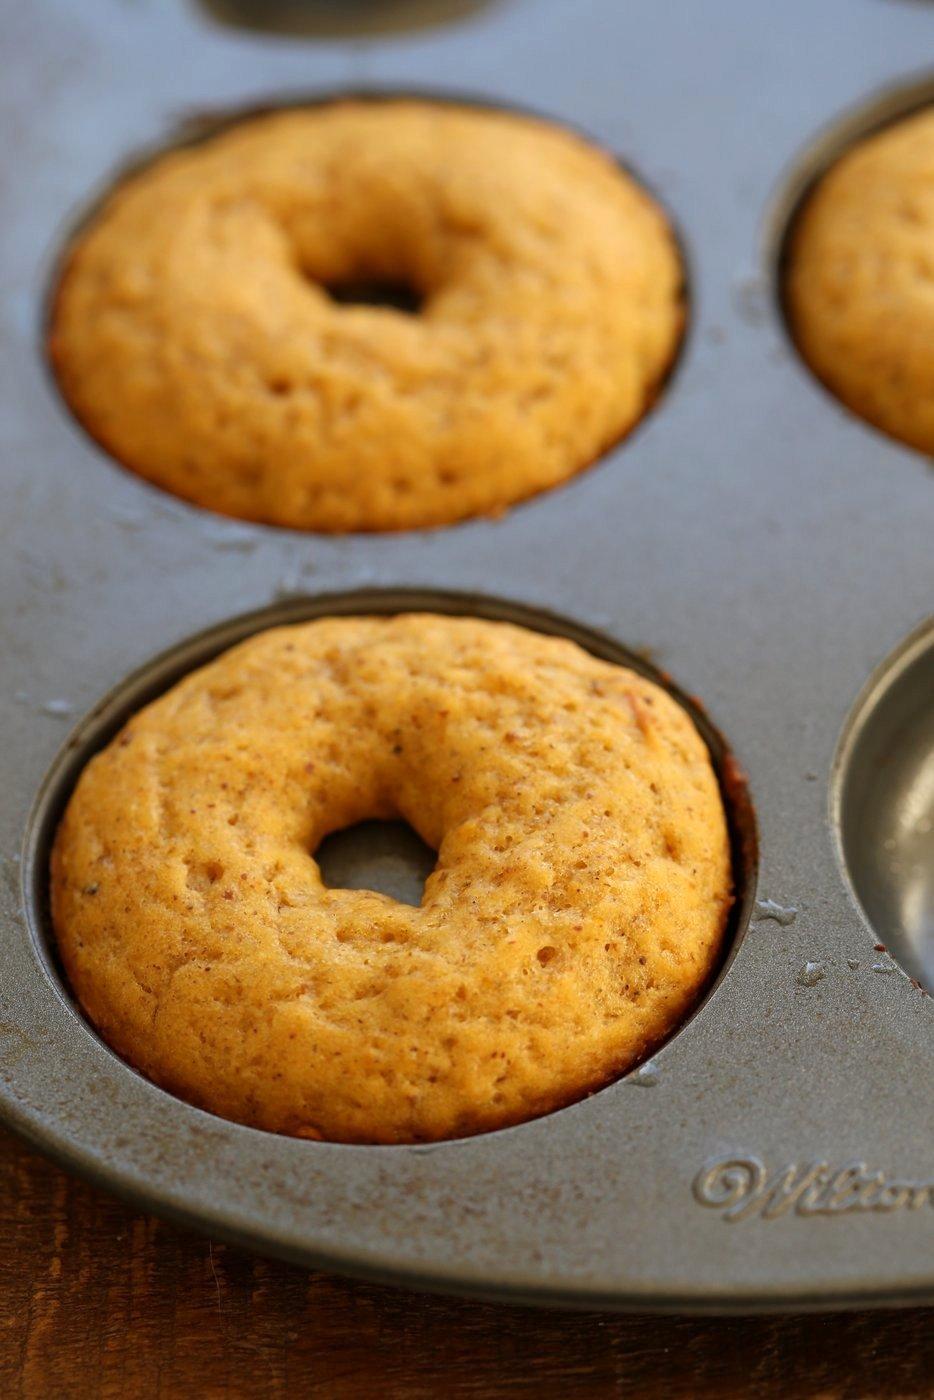 Vegan Pumpkin Donuts with Cinnamon Sugar. Soft, Spiced, Amazing. Vegan Doughnuts. Pumpkin Cinnamon sugar Donuts. Nut-free option.#vegan #veganricha